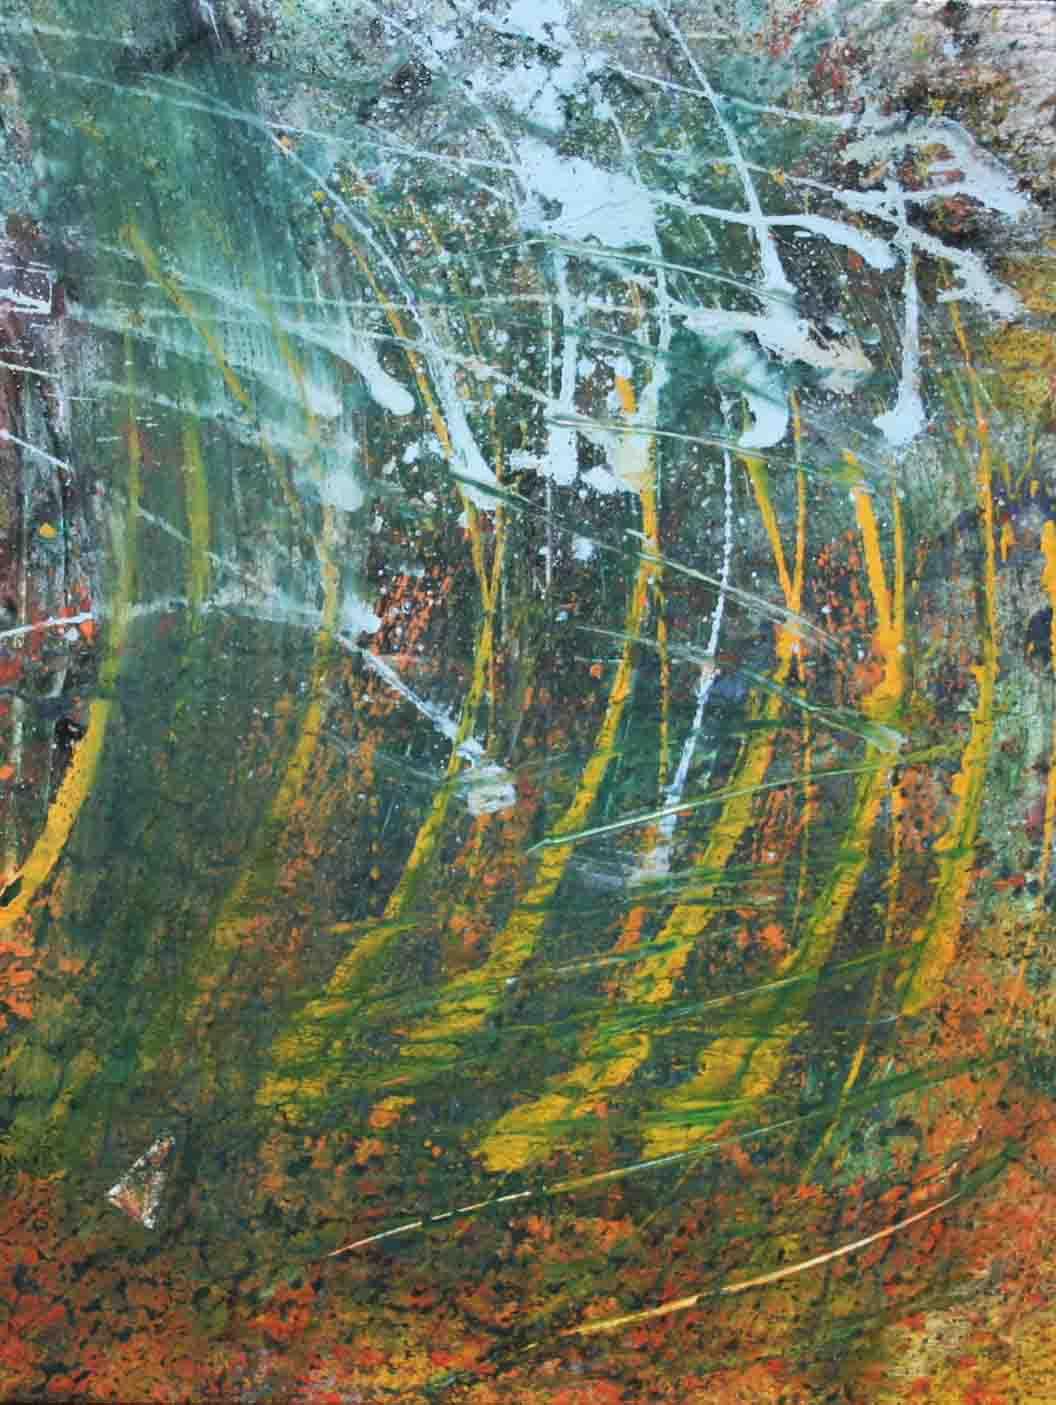 tableau abstrait euphorie violente en jaune et vert